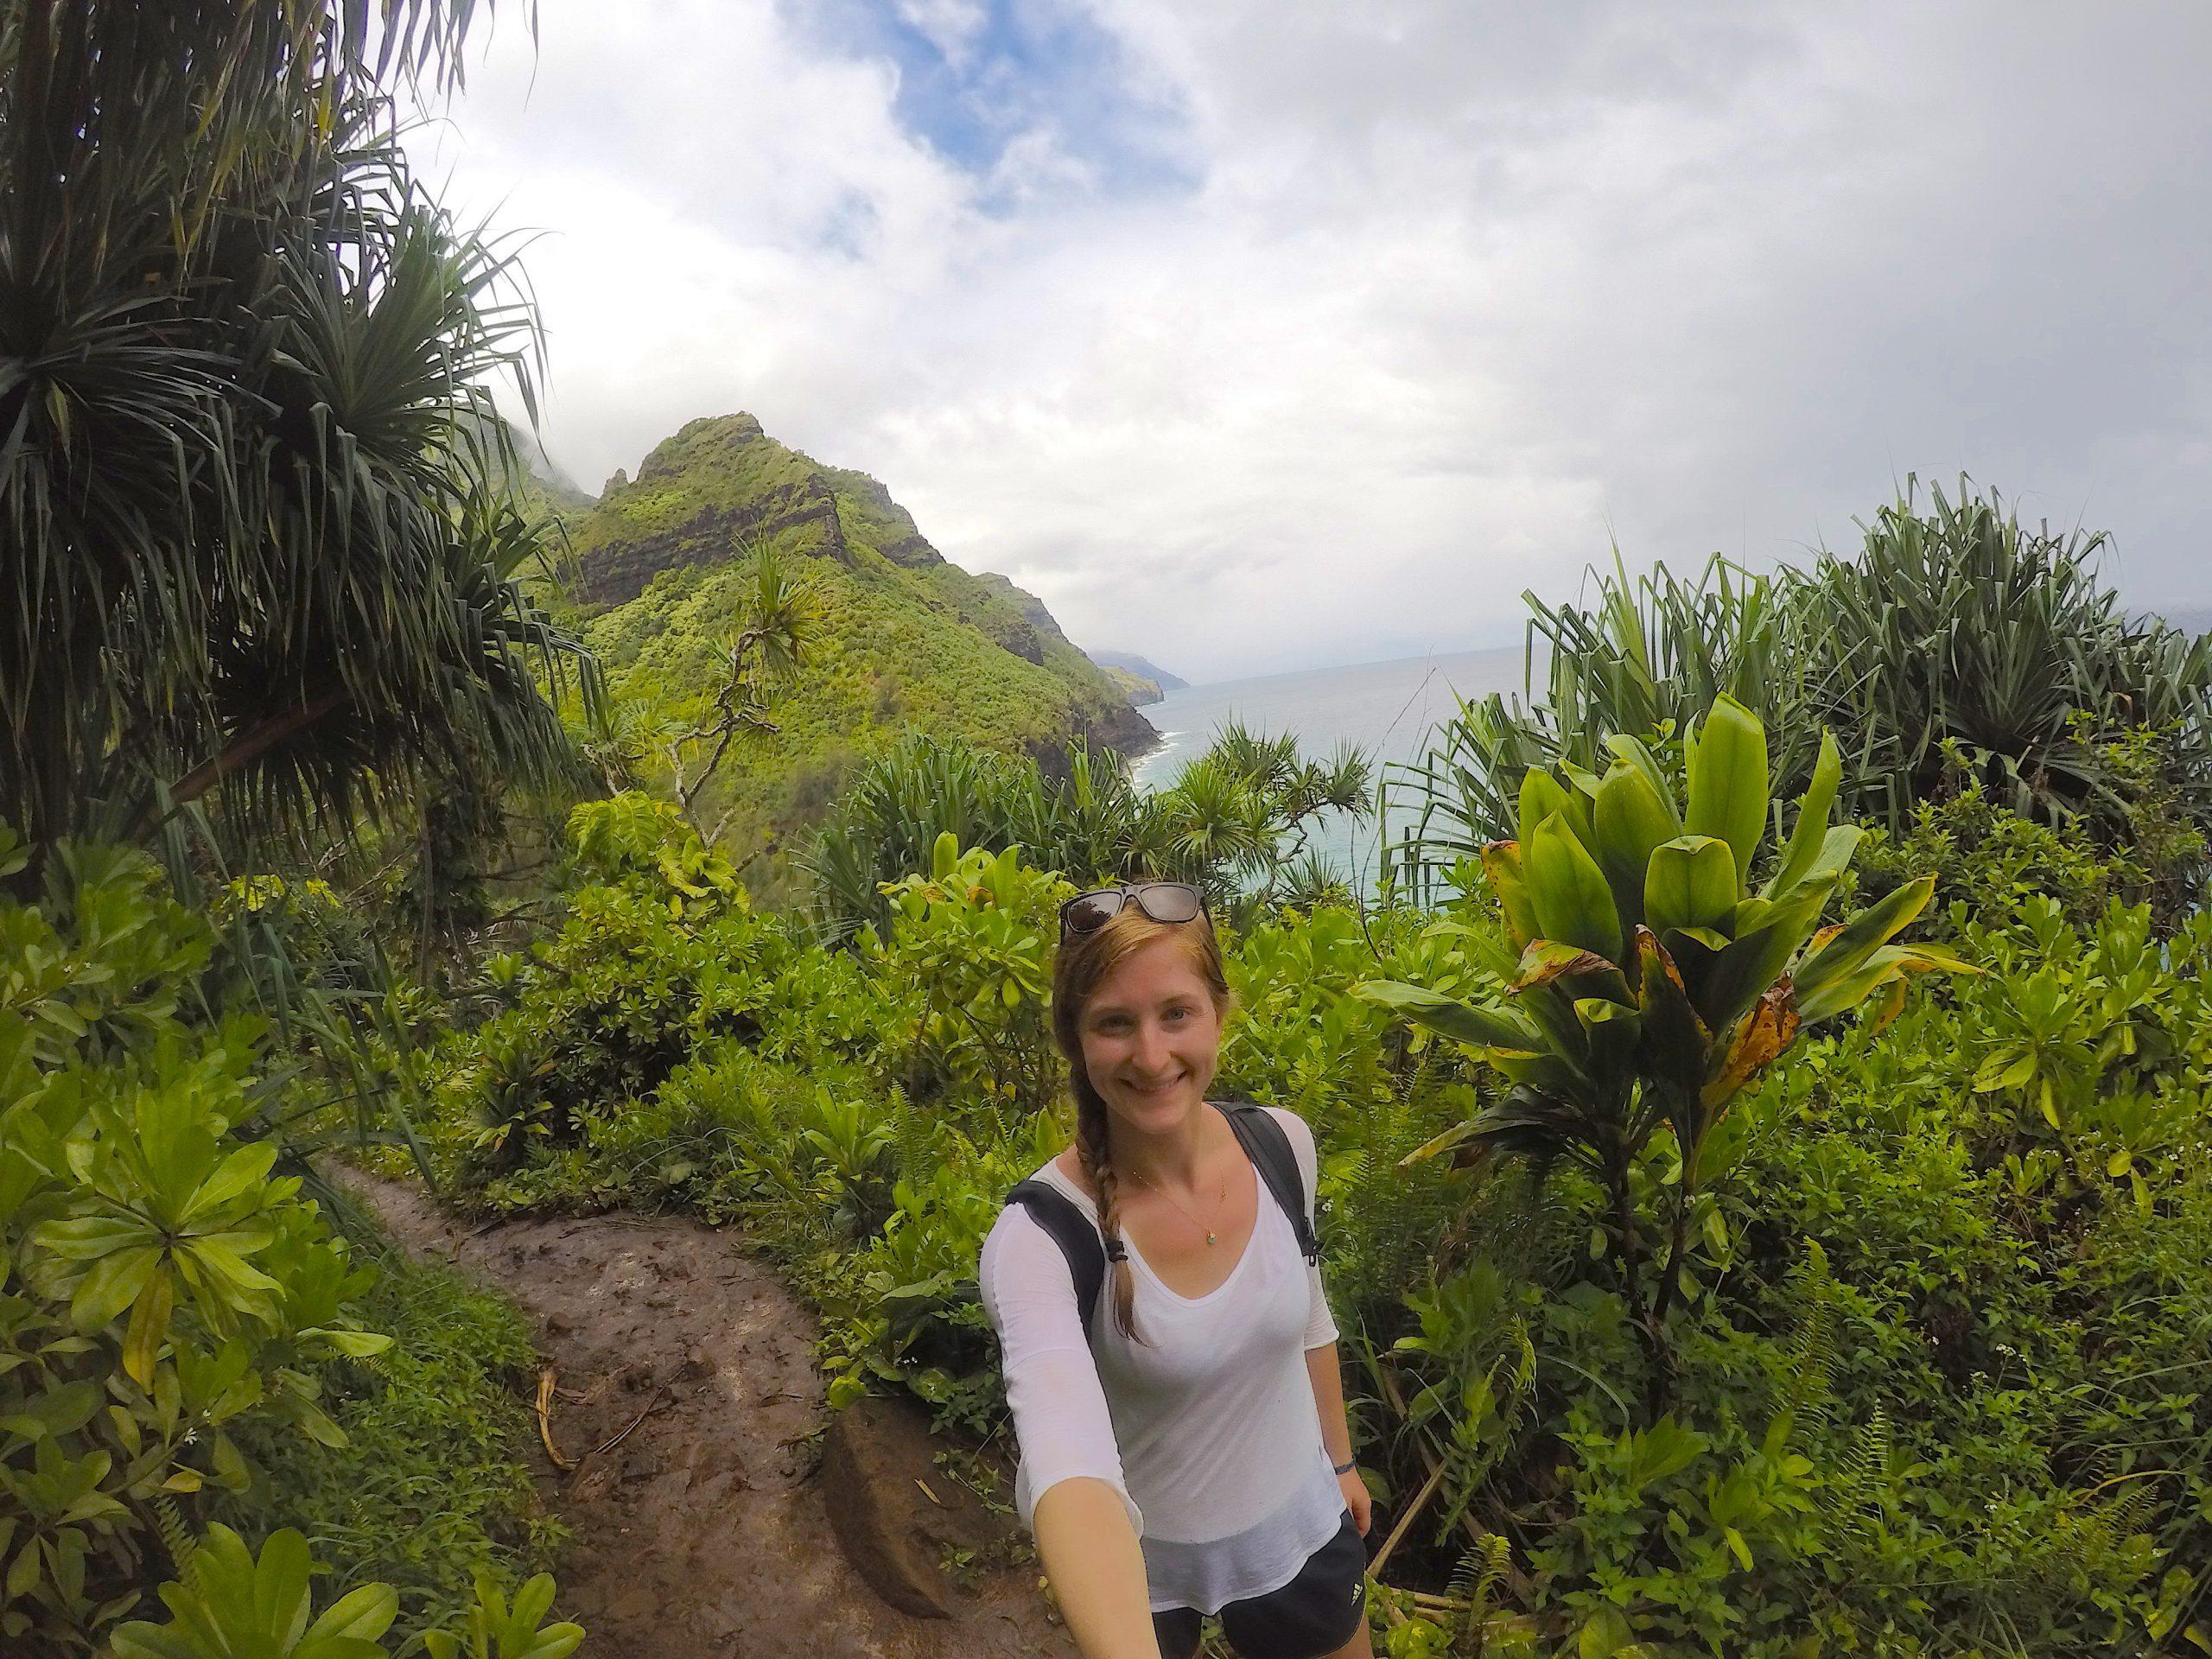 Voyages Yulgo Hawaii Kauai NaPali Coast Hike